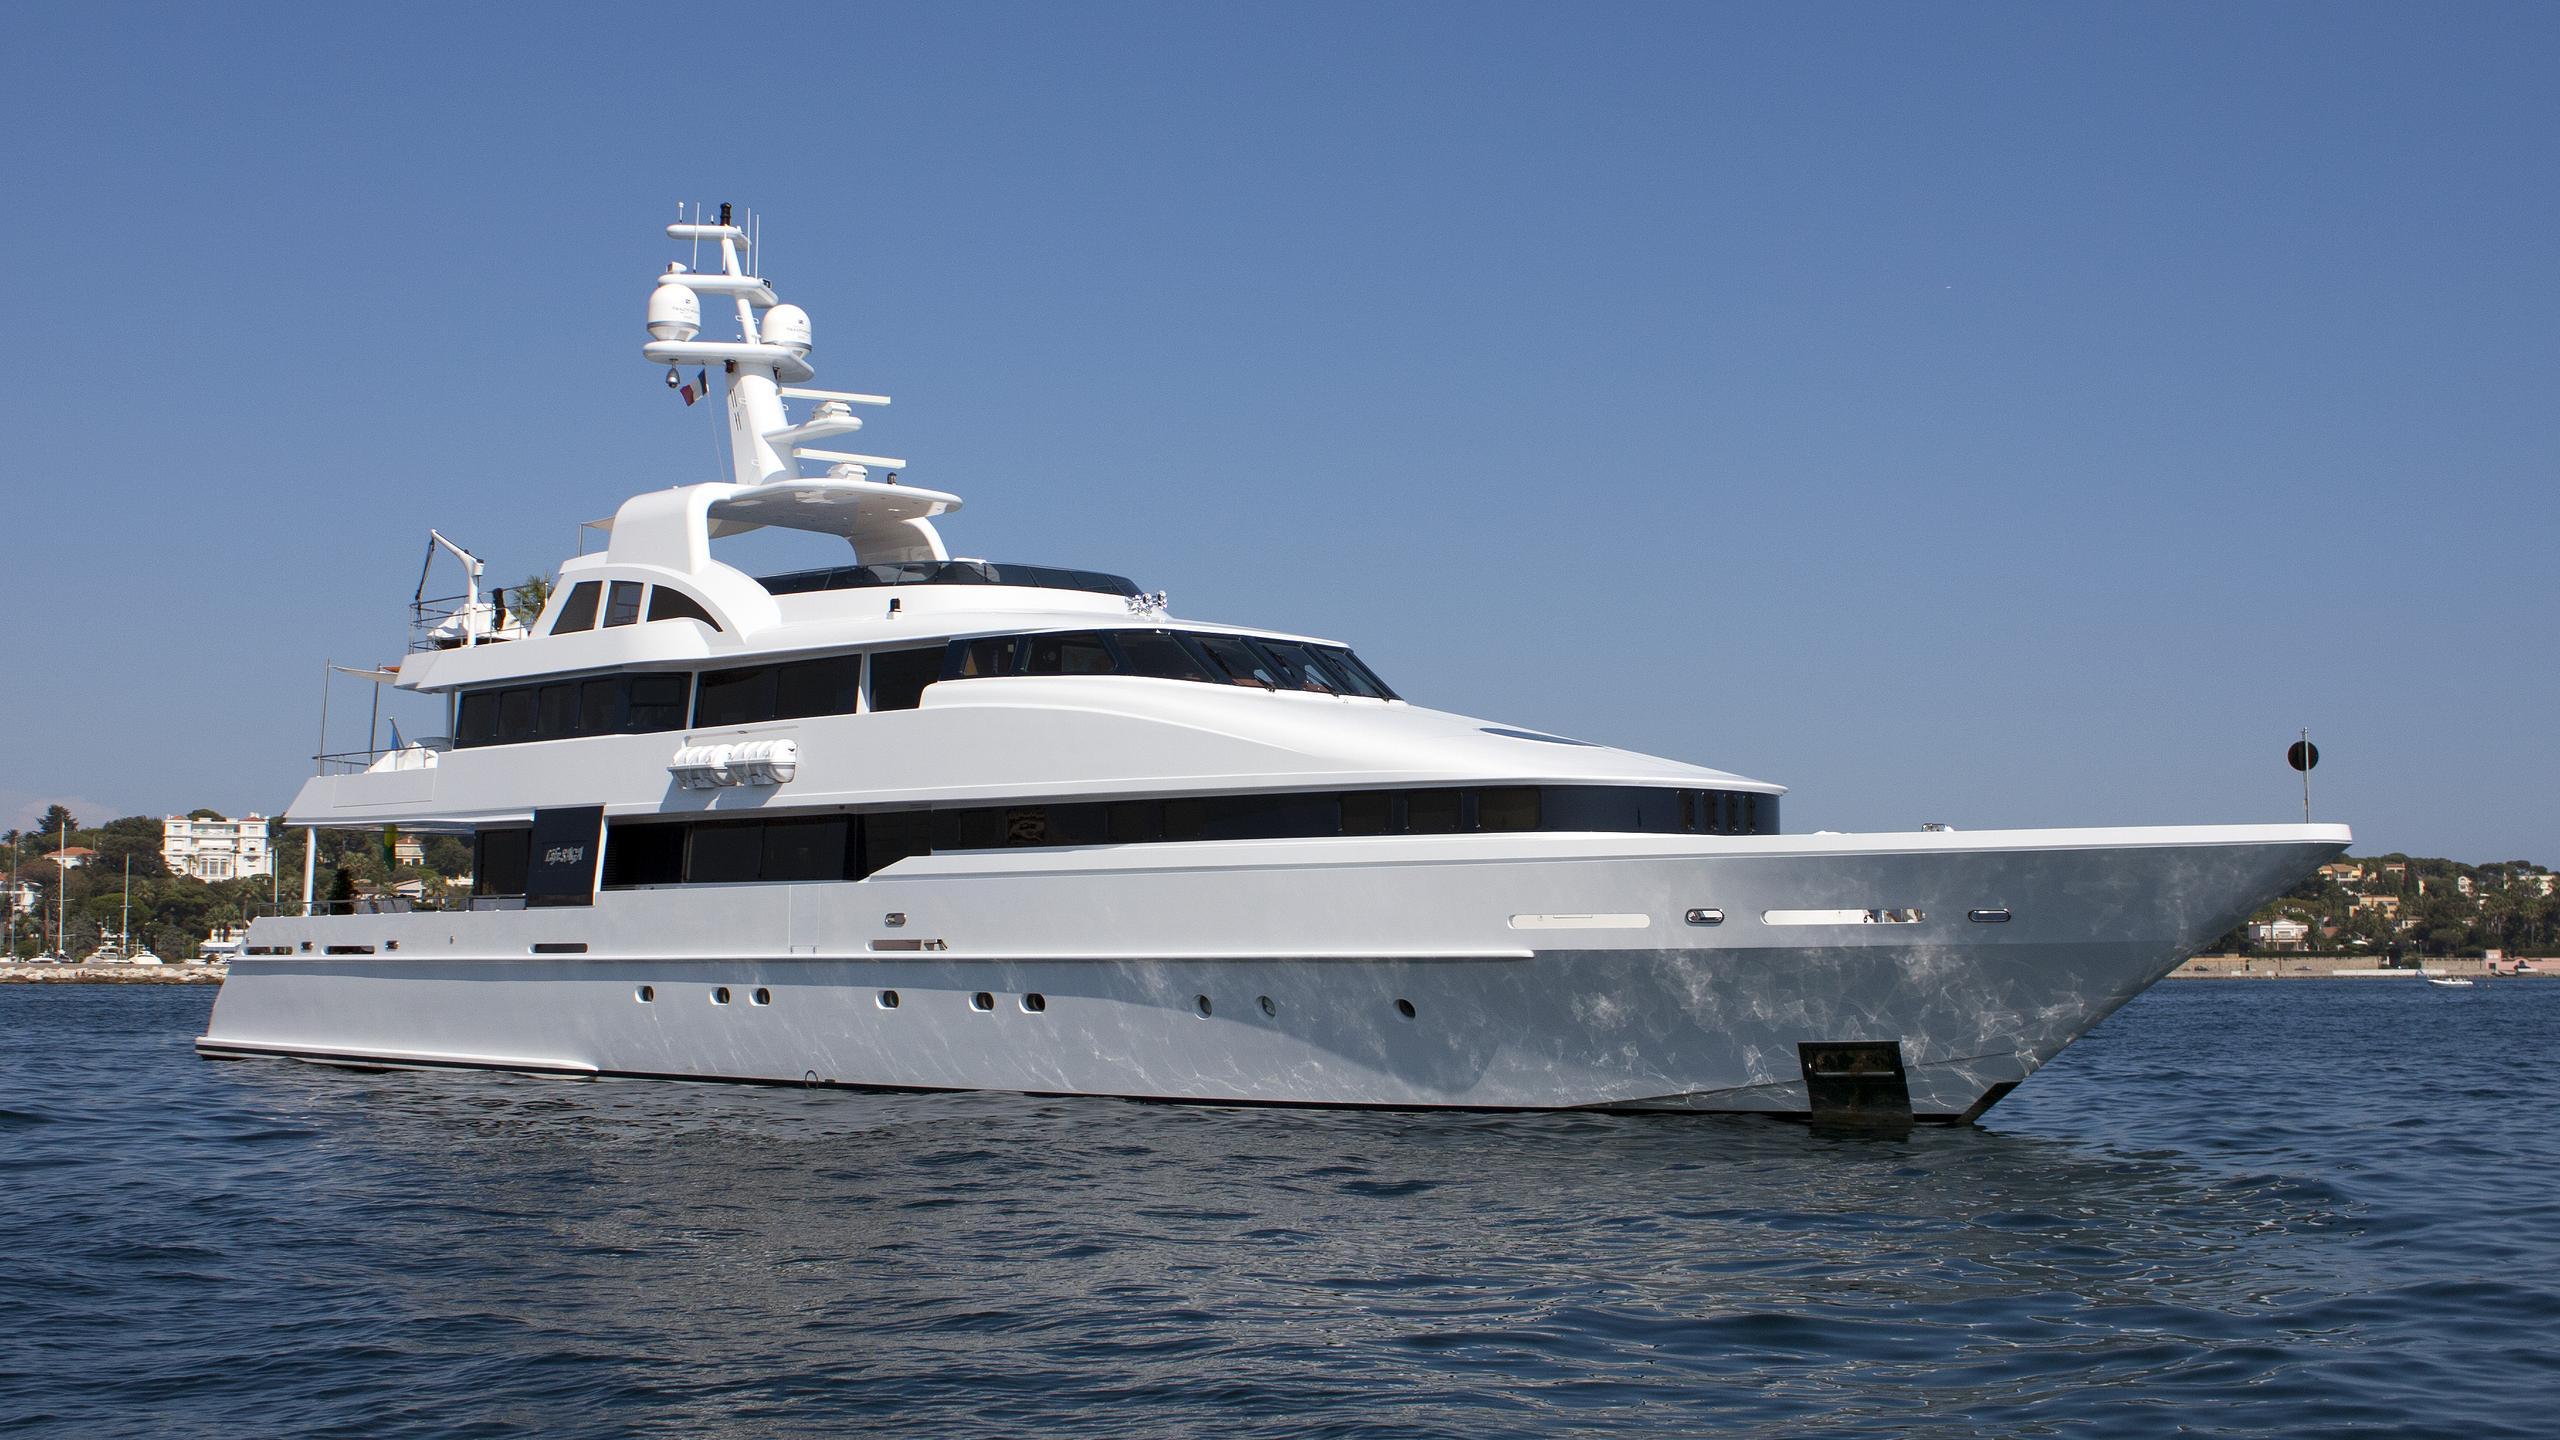 life-saga-motor-yacht-heesen-1994-42m-profile